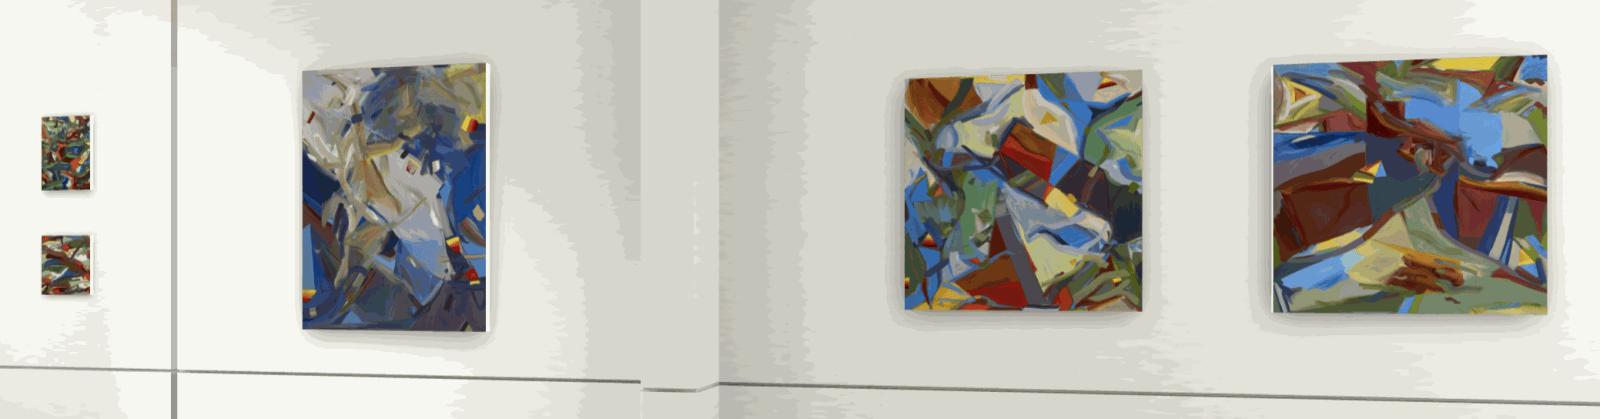 Susan Sommer: Plein Air Abstraction